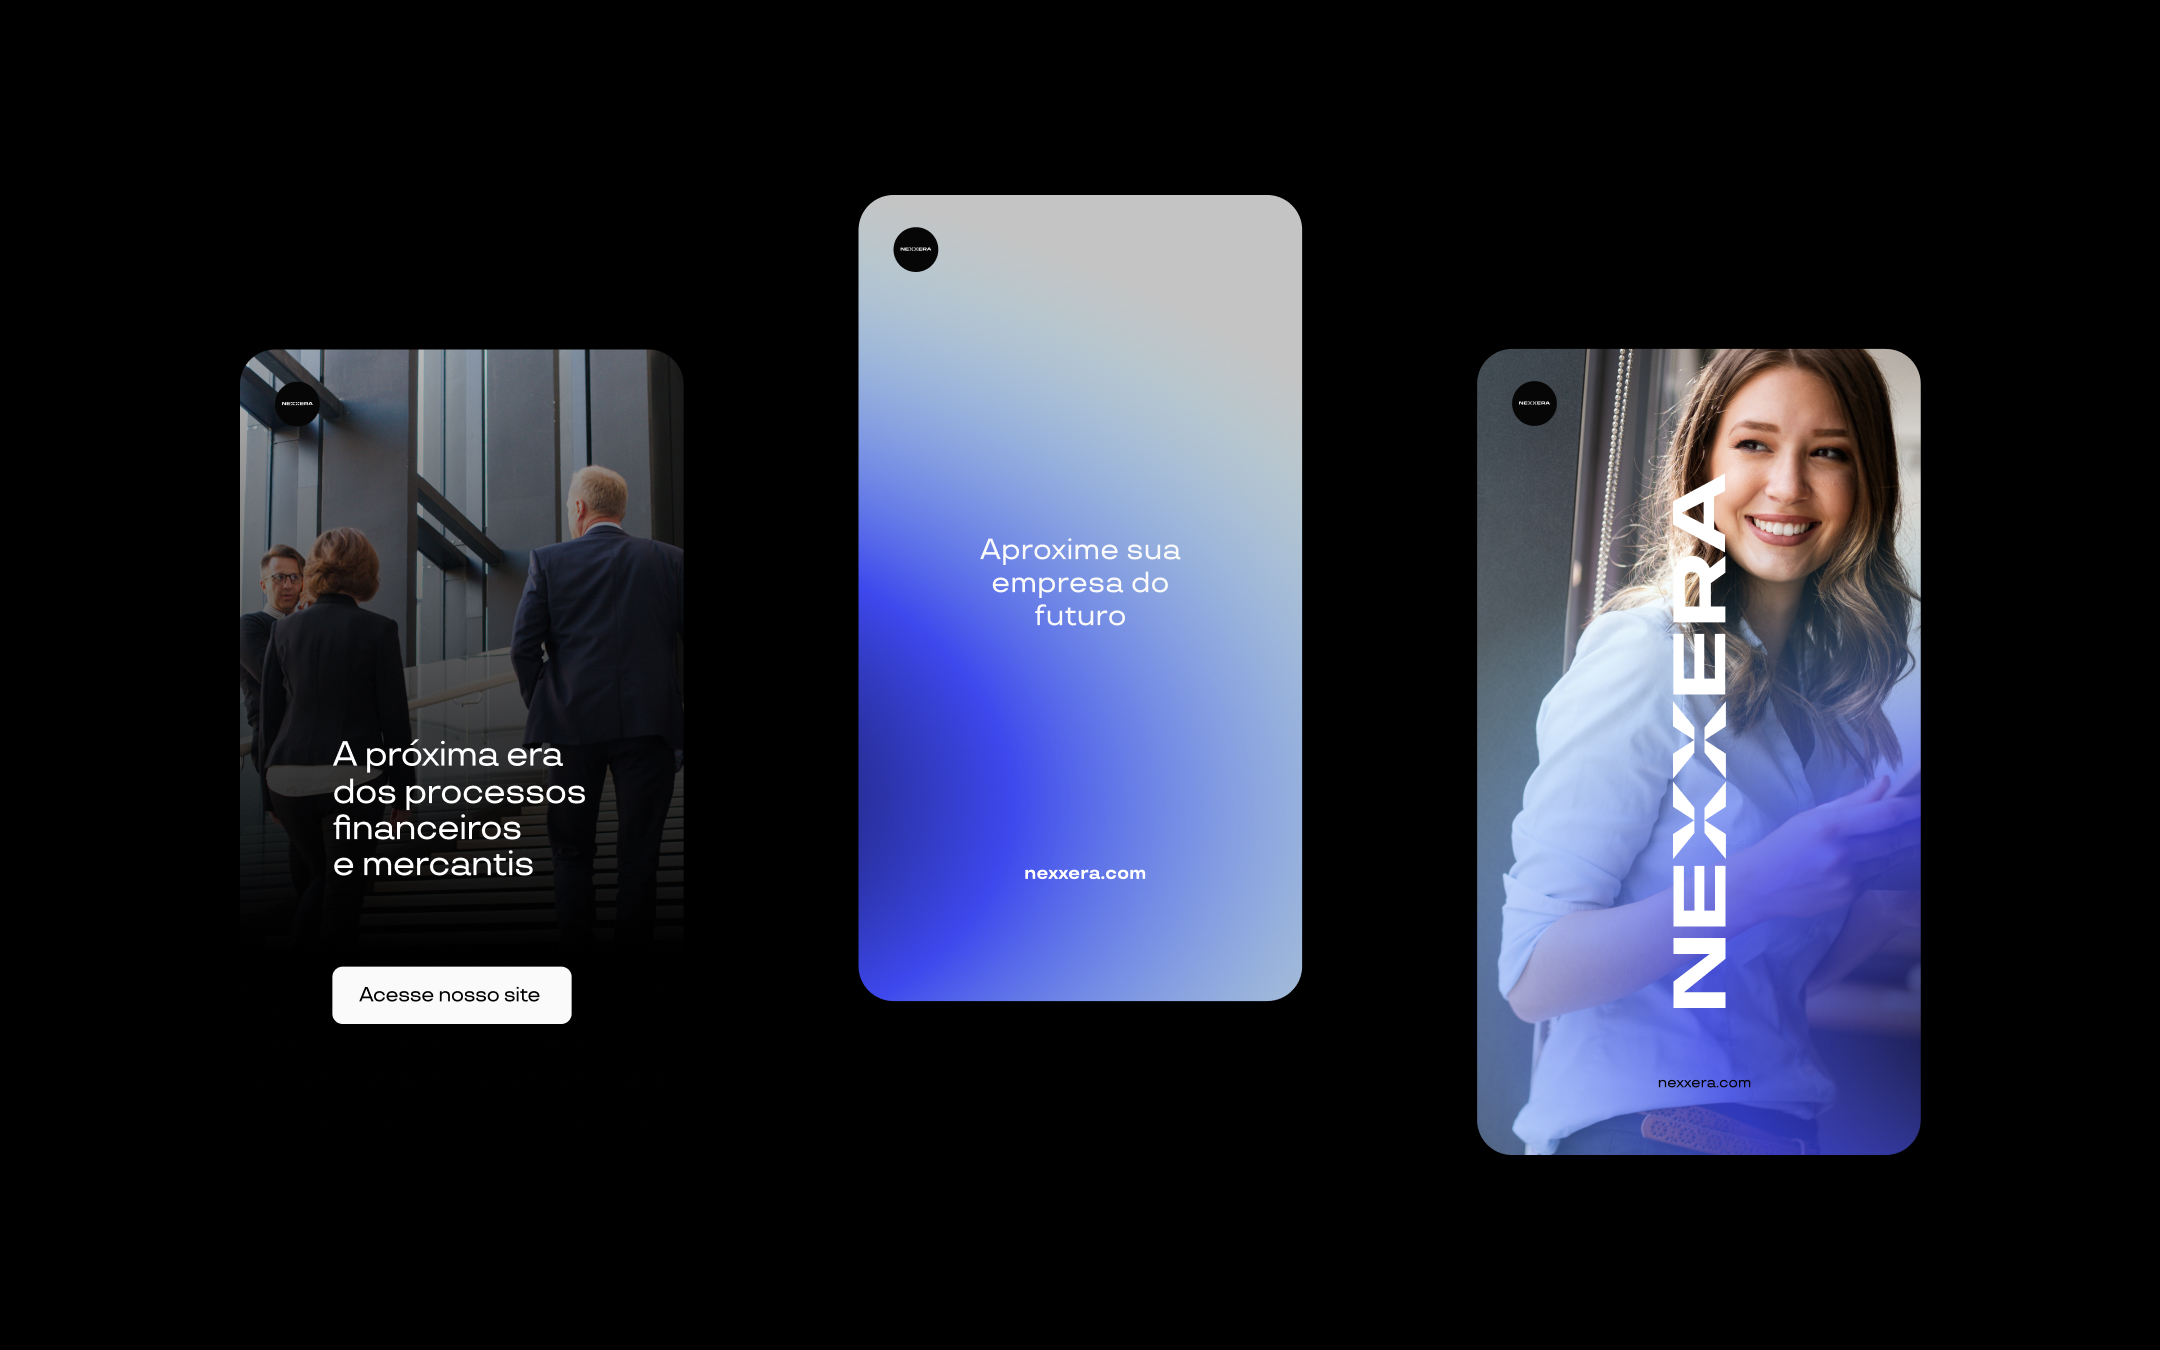 Nexxera-Branding-Rebrand-Design-10